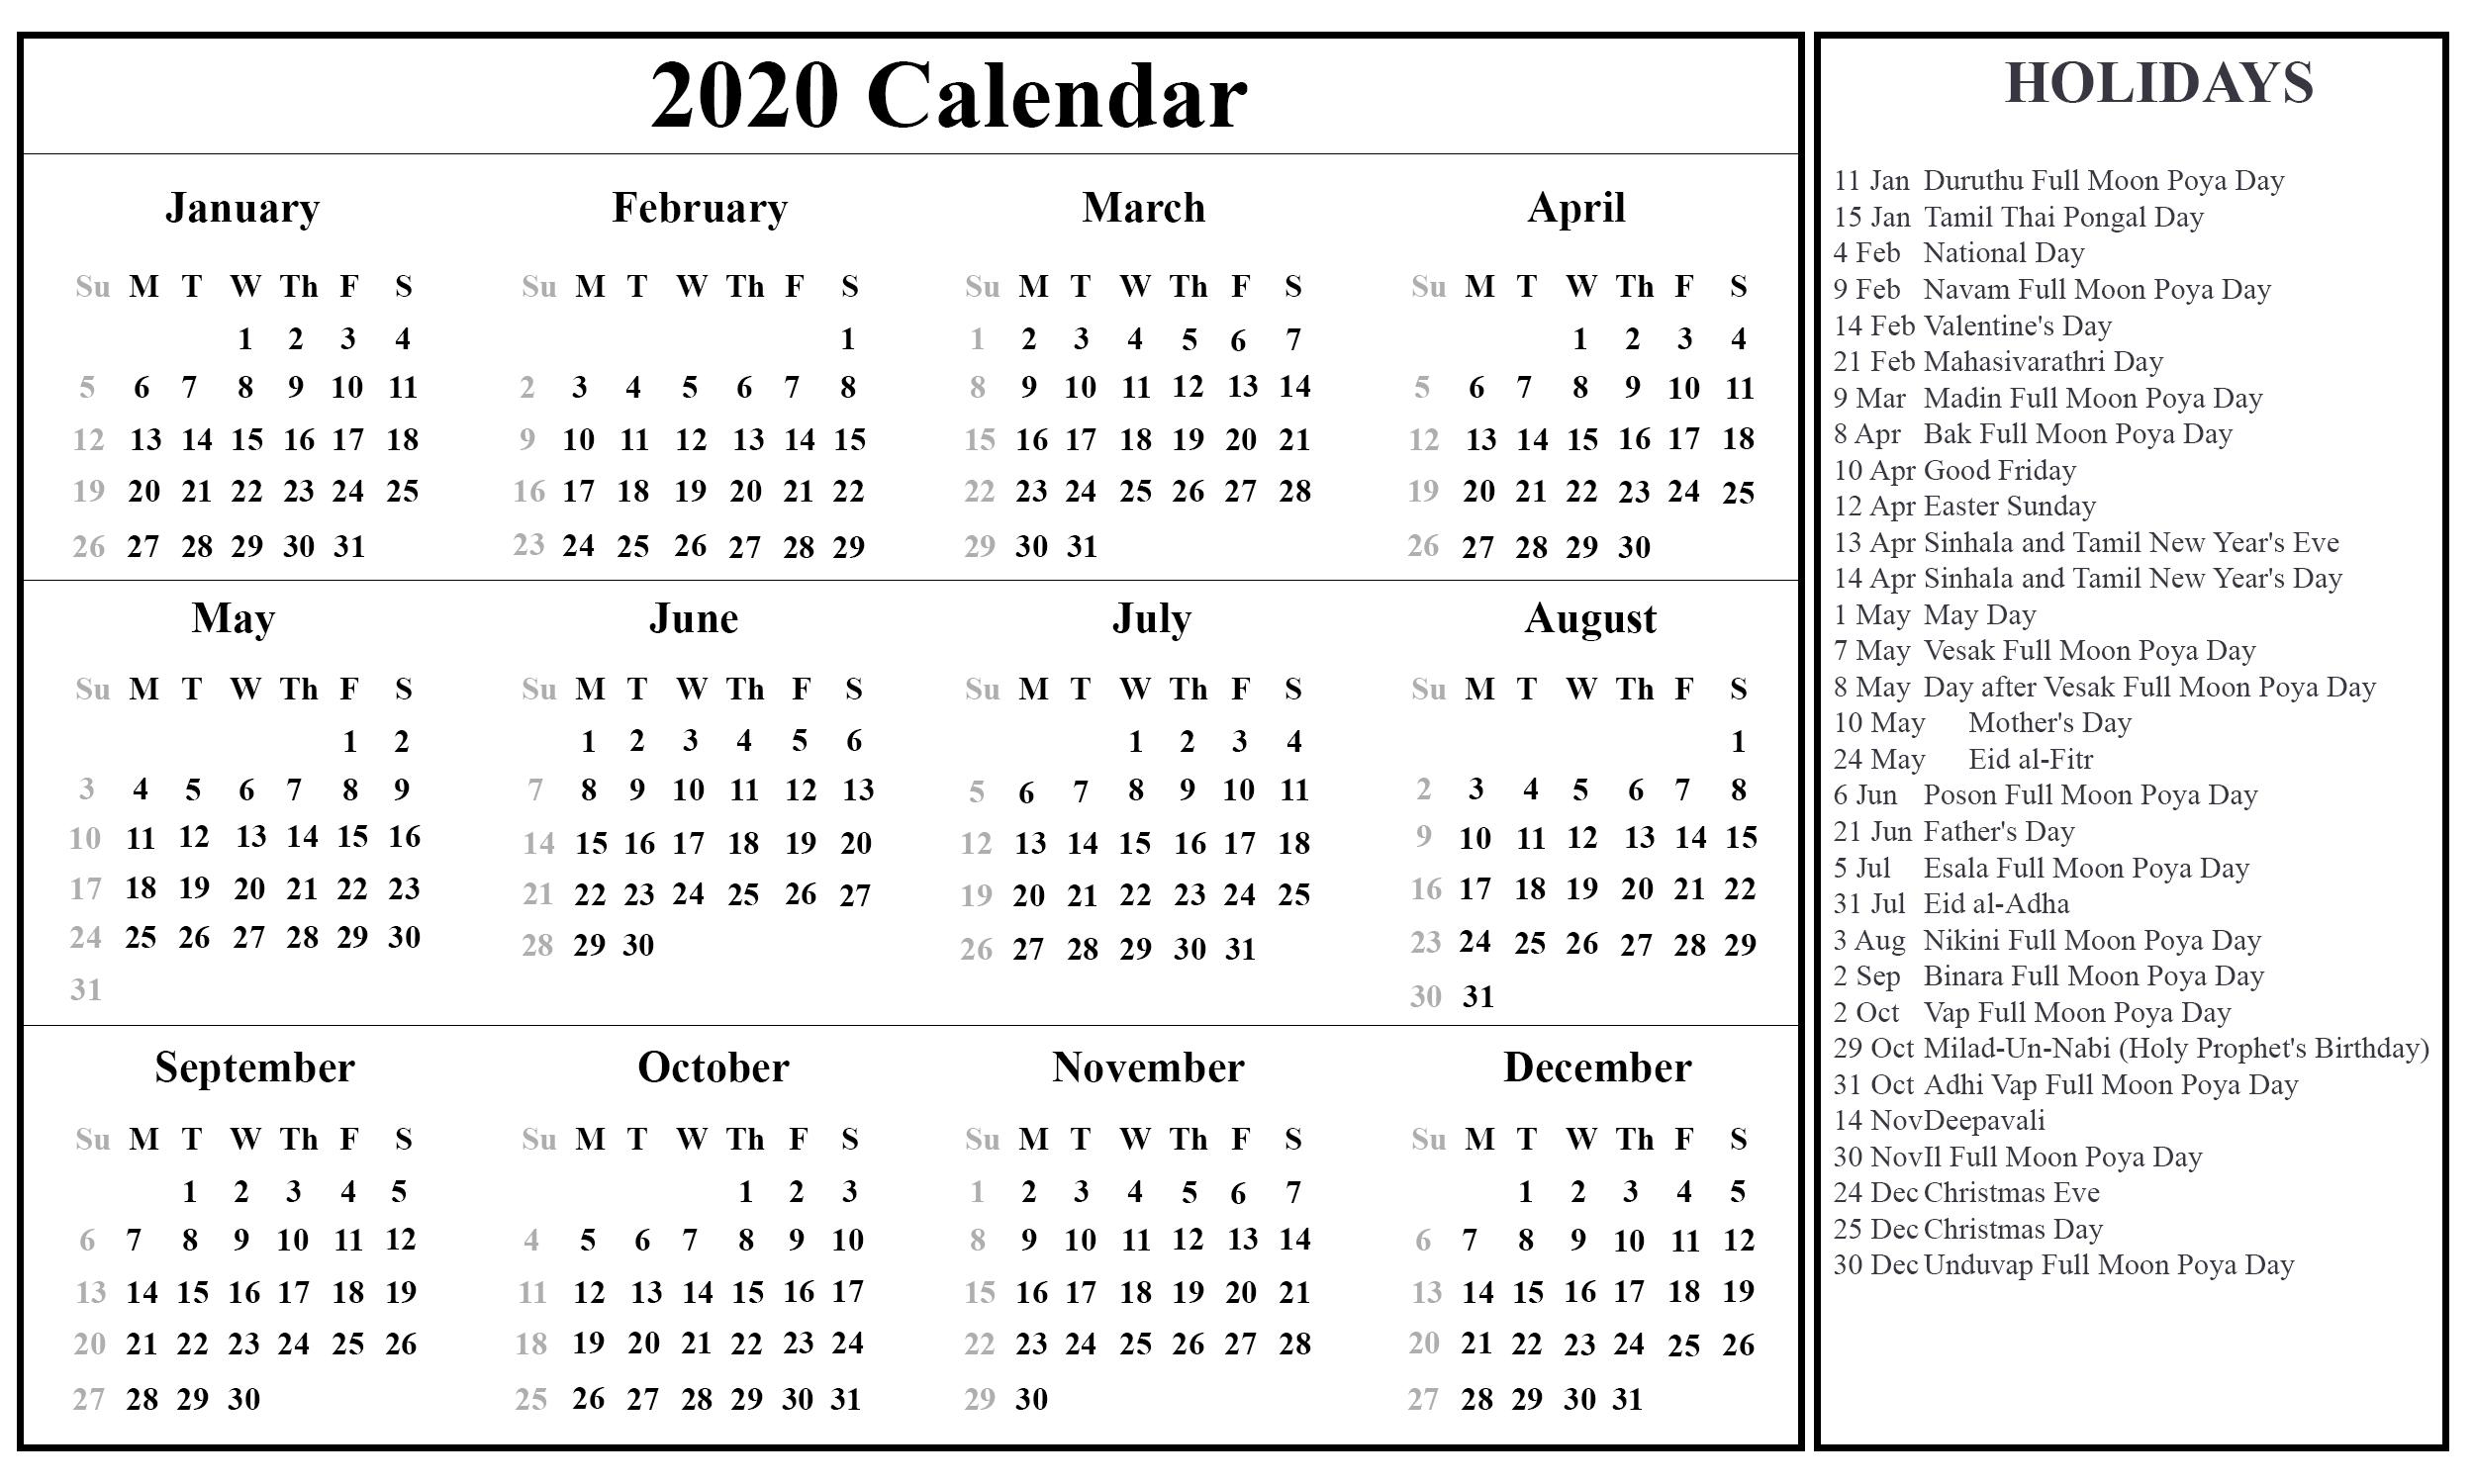 2020 Calendar And Holidays